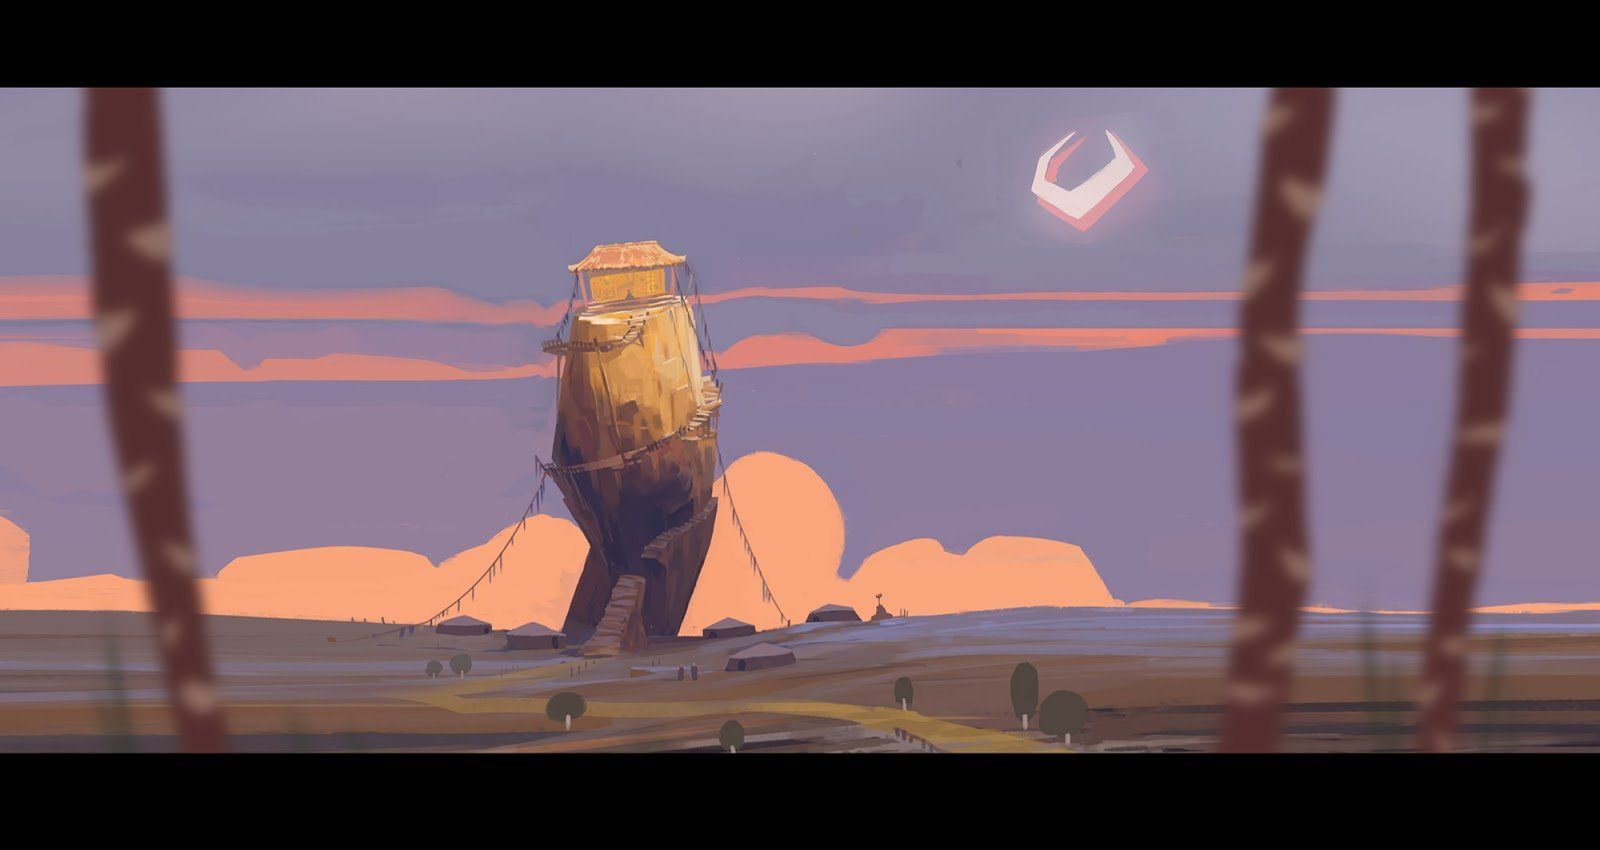 Sakhius Gal Concept David Gau Art Animation Background Concept Art